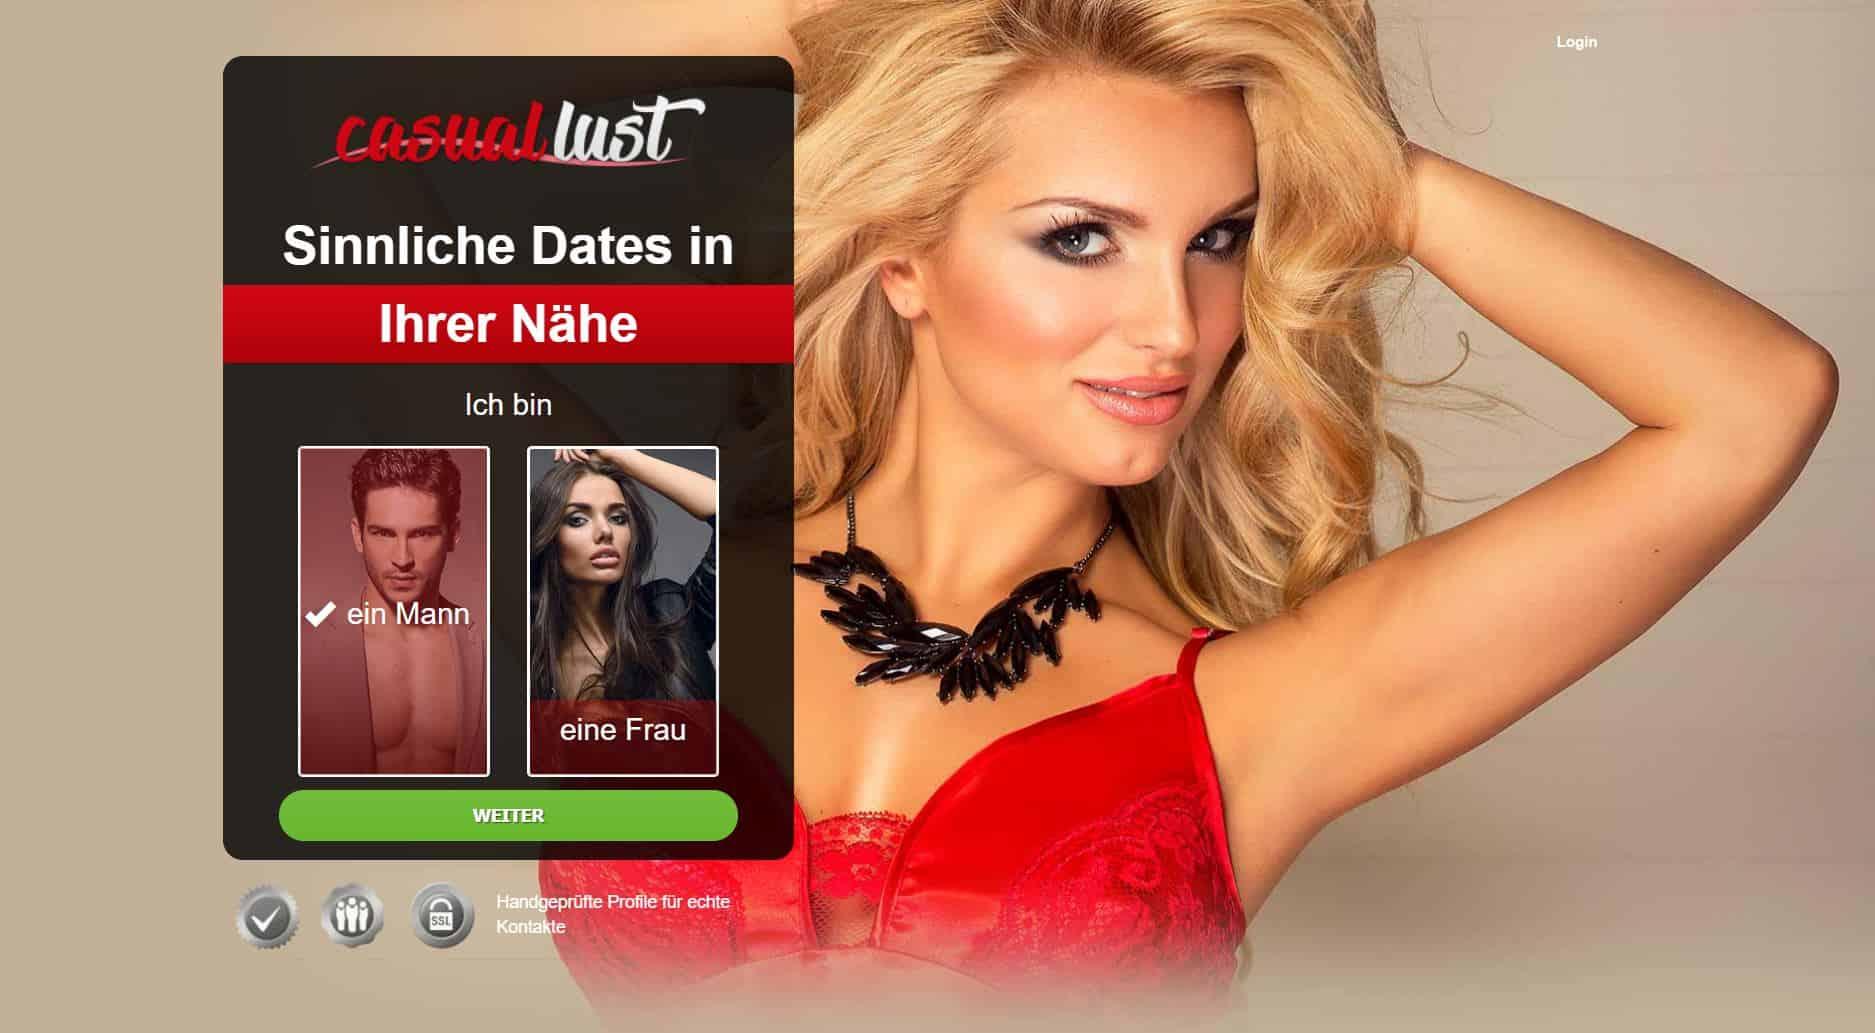 Testbericht: Casual-Lust.com Abzocke